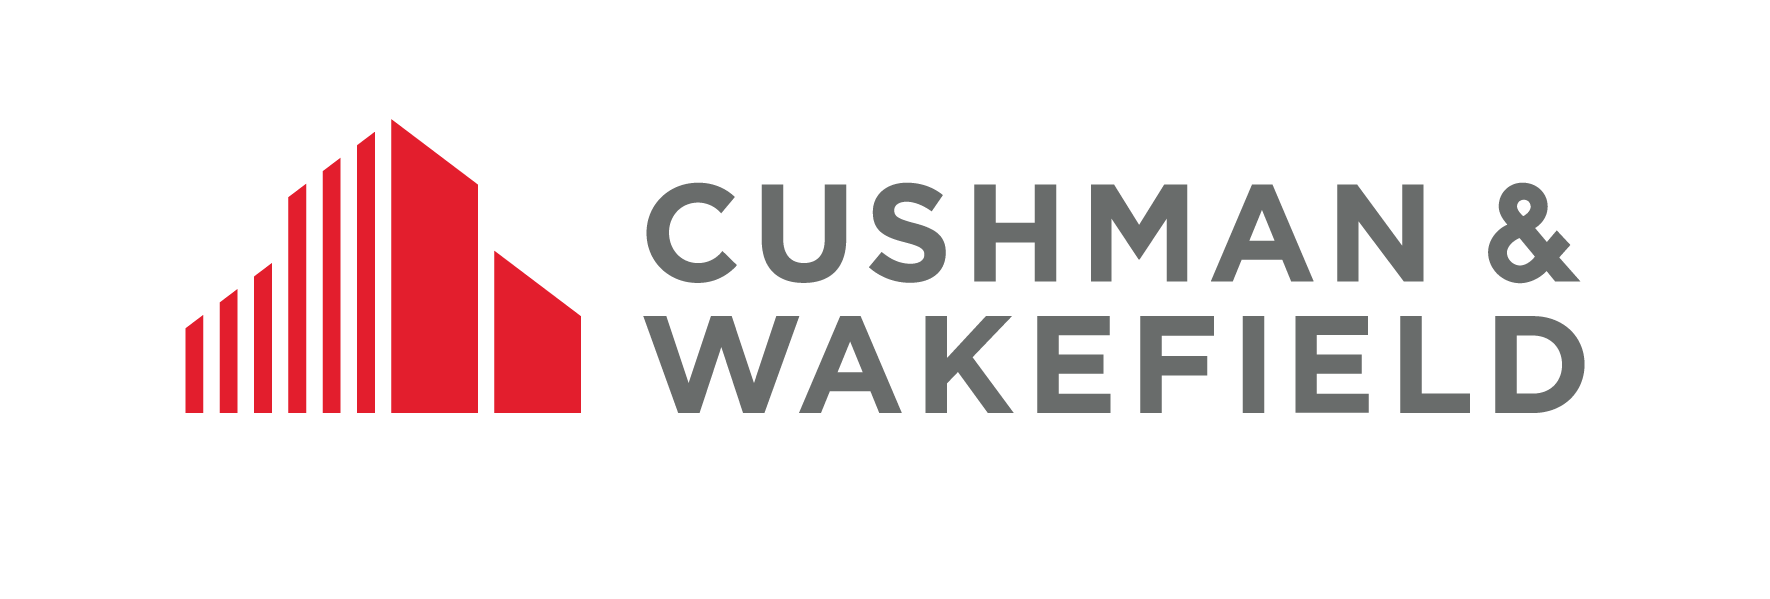 kisspng-logo-cushman-wakefield-real-estate-real-property-cushman-5b525f52c917a5.3259358215321250108237.png